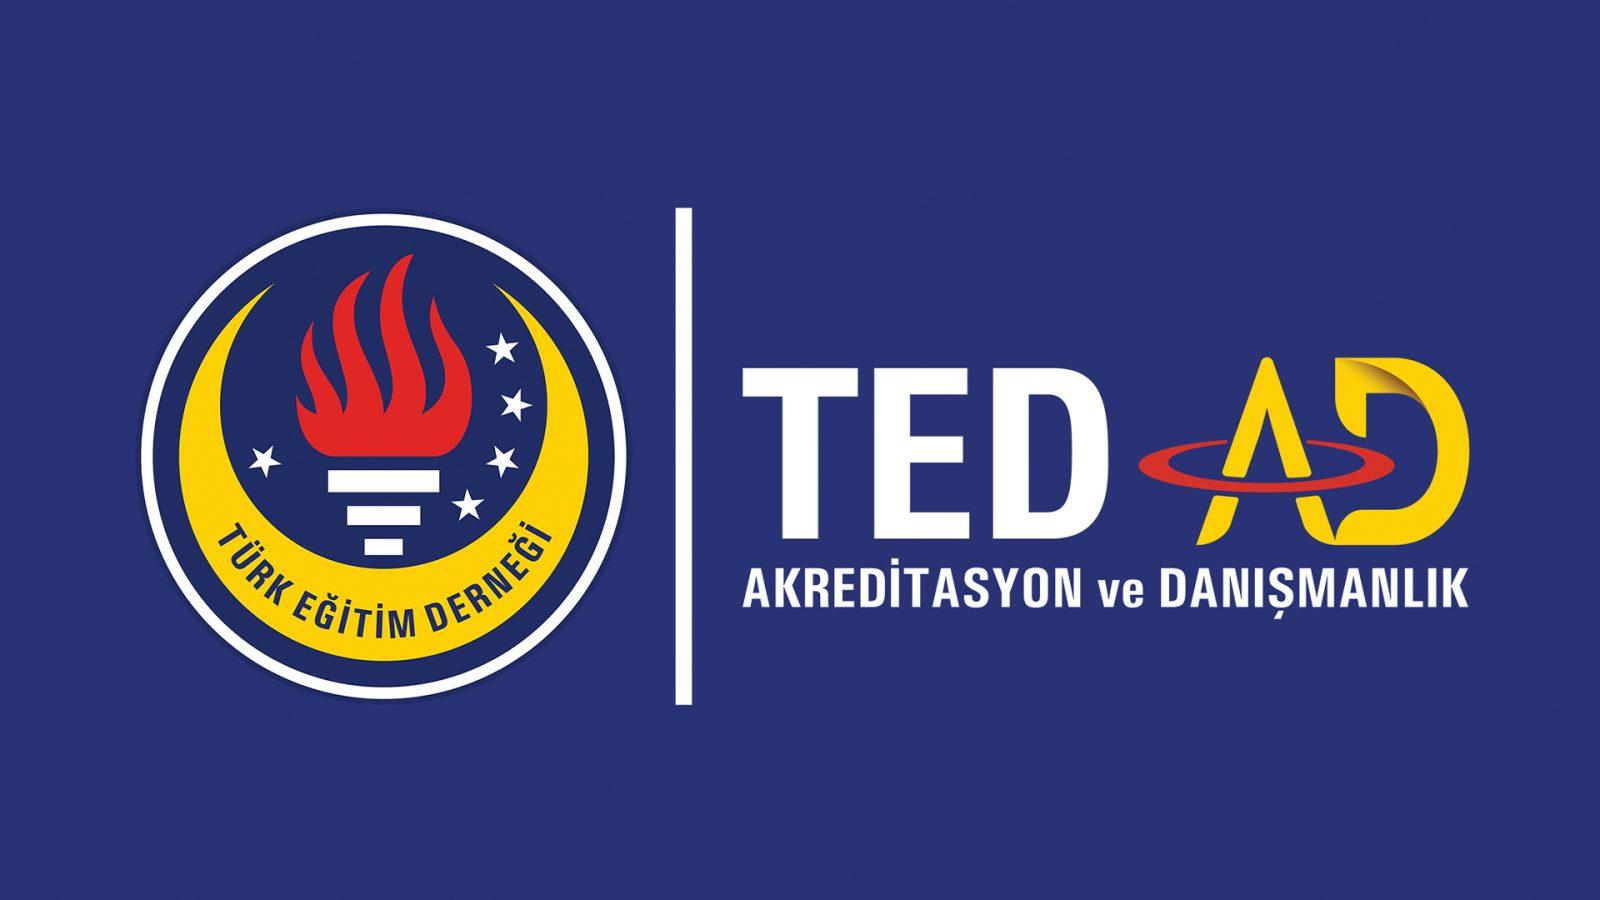 Sİte_TEDAD